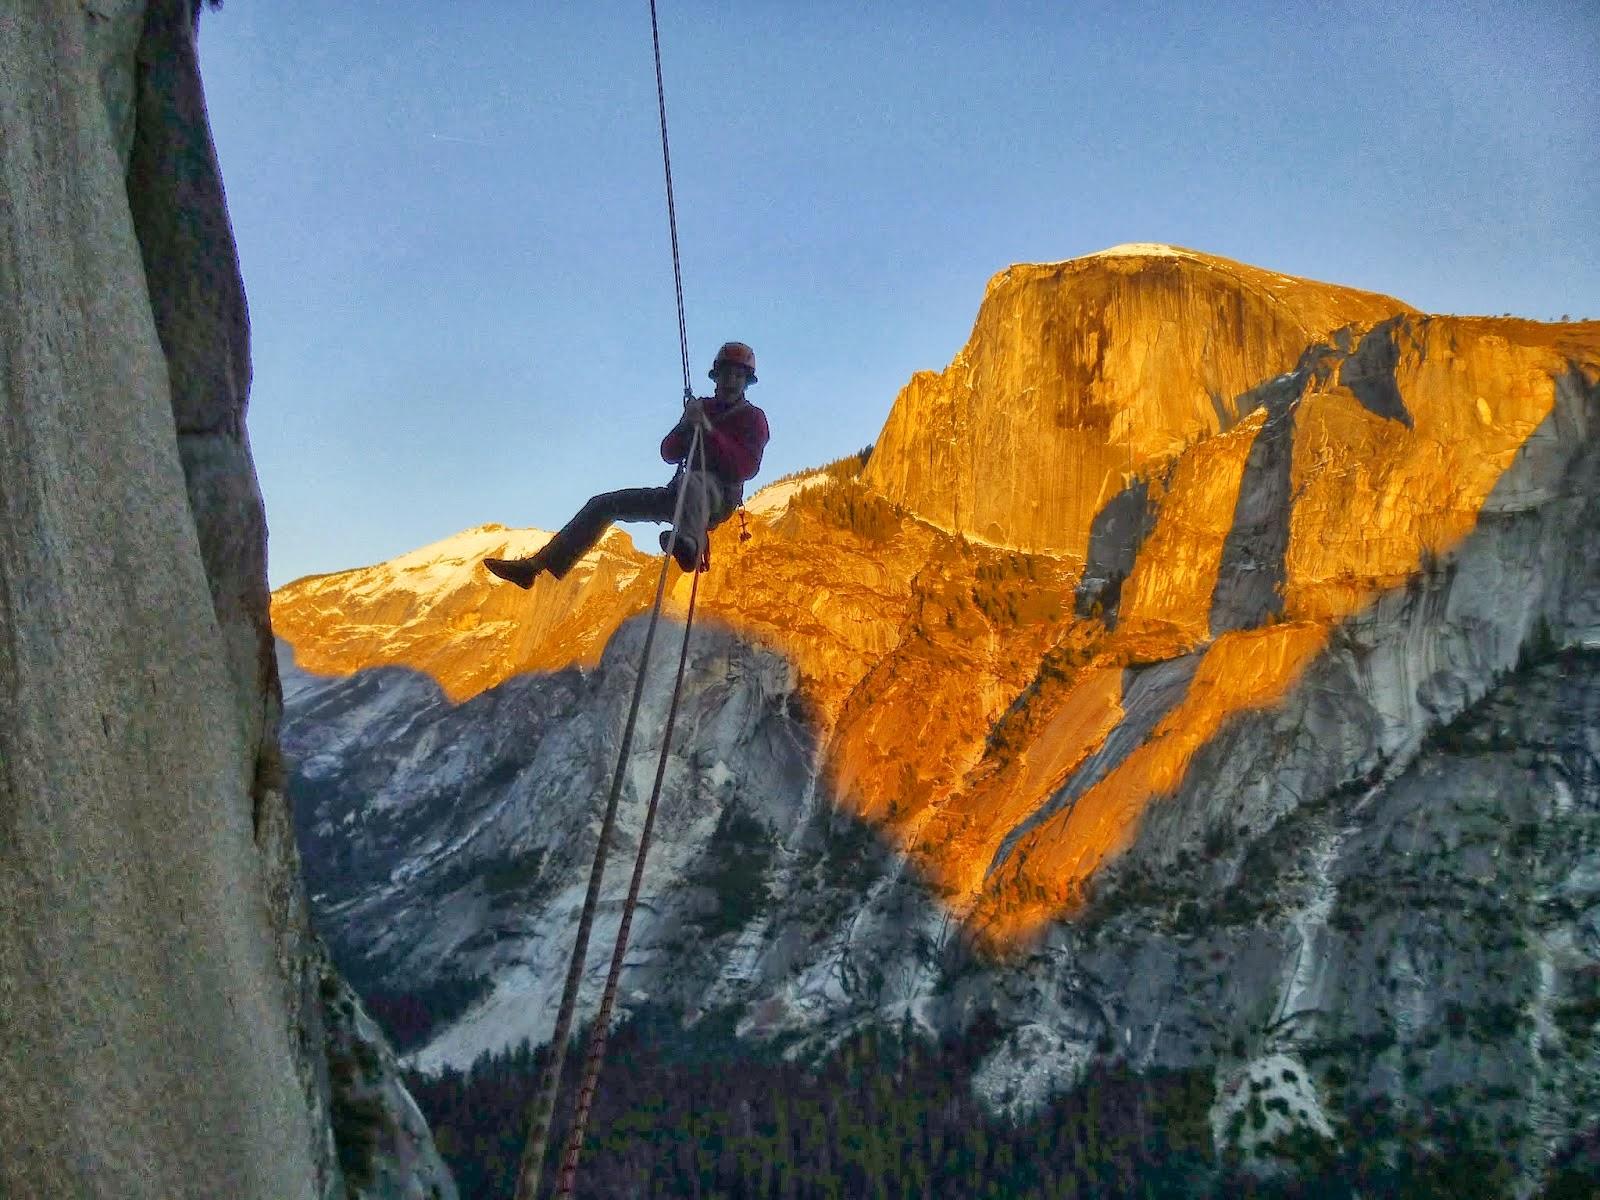 Hiking and Climbing Adventures: Fun in the Sun at Yosemite +